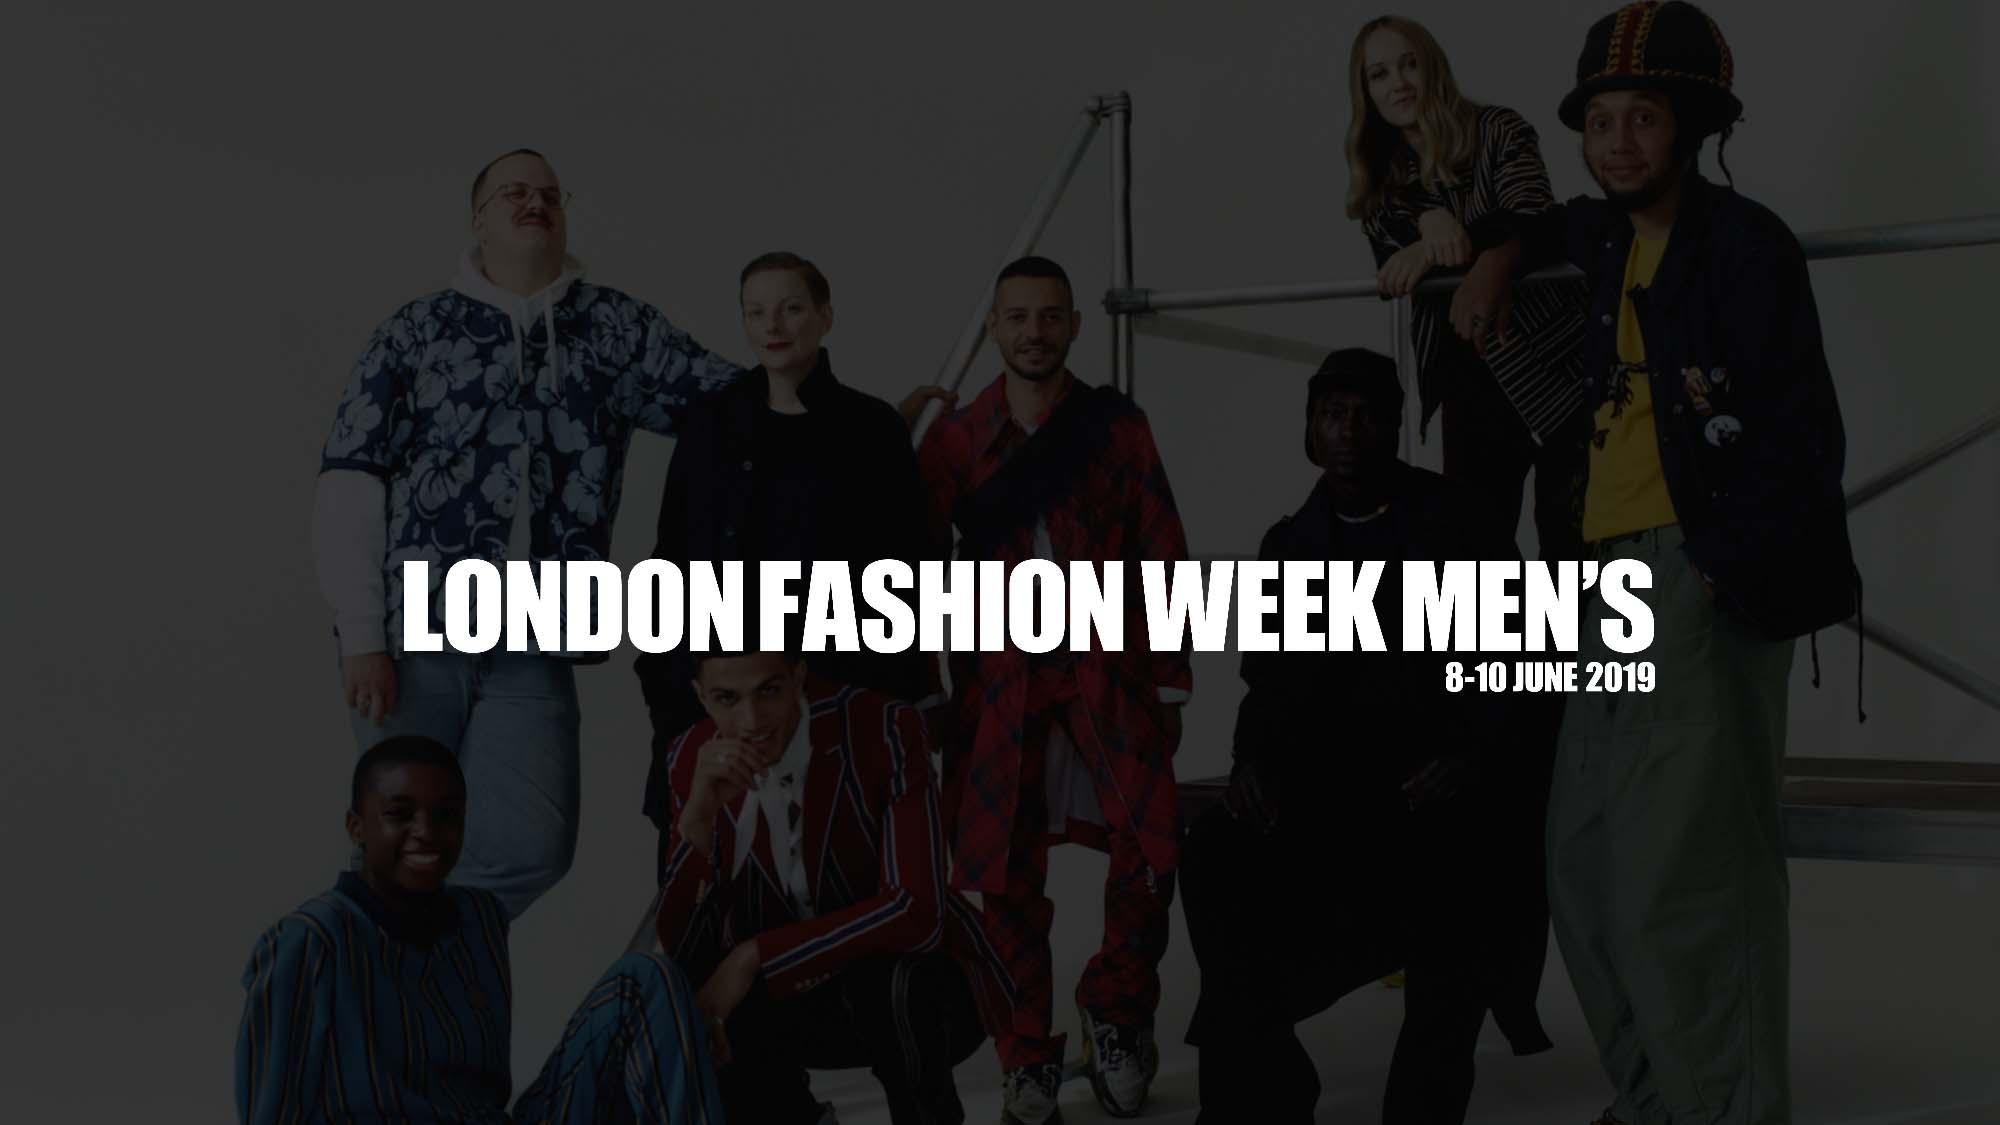 London fashion week men's june 2019 is a city wide celebration of creative diversity